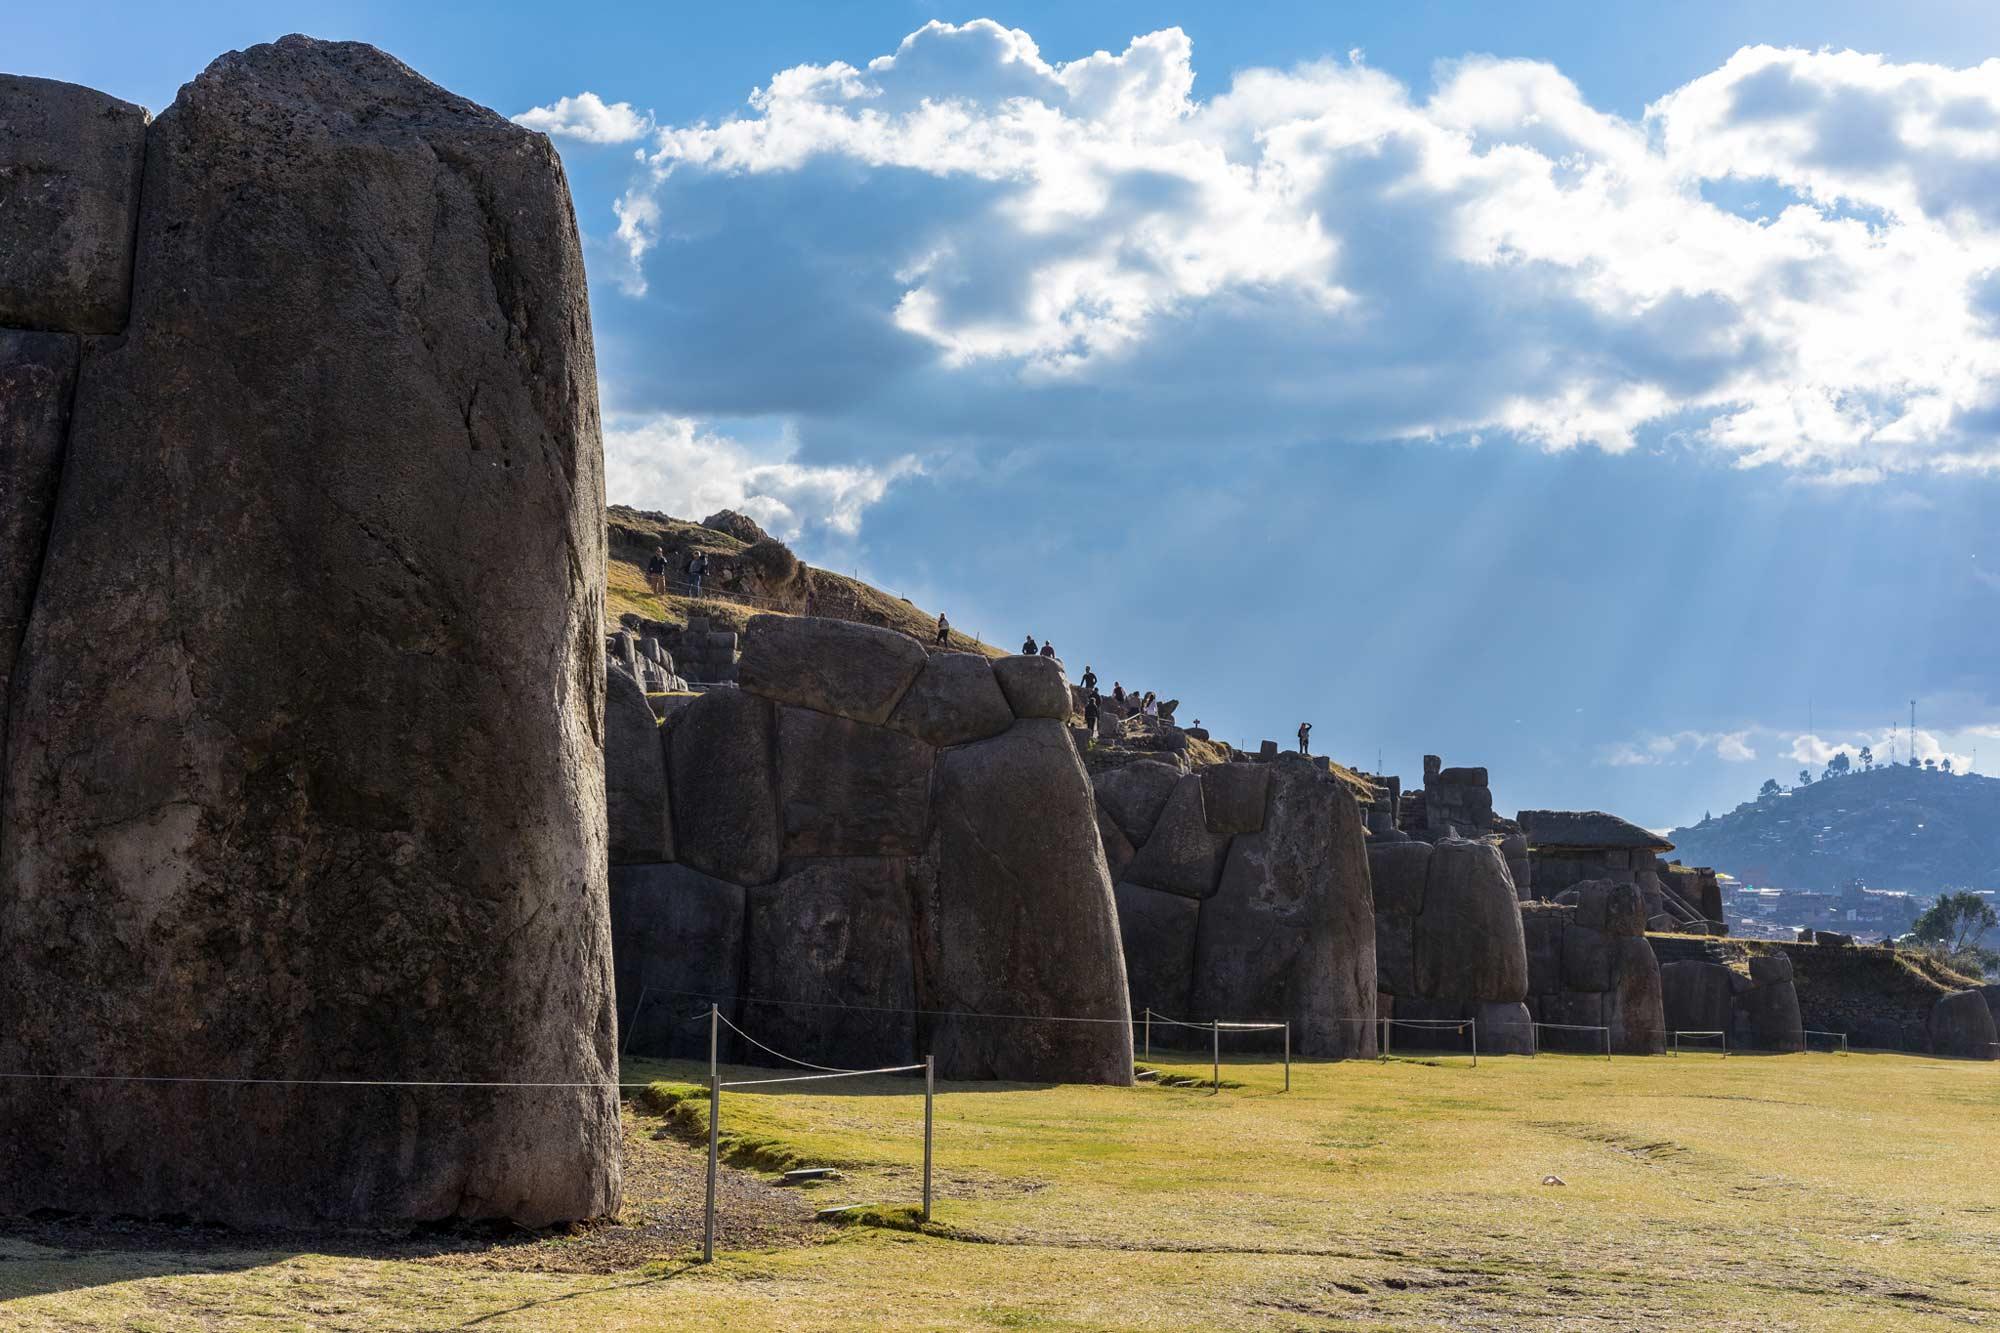 Sacsayhuaman - Massive Inca Fortress